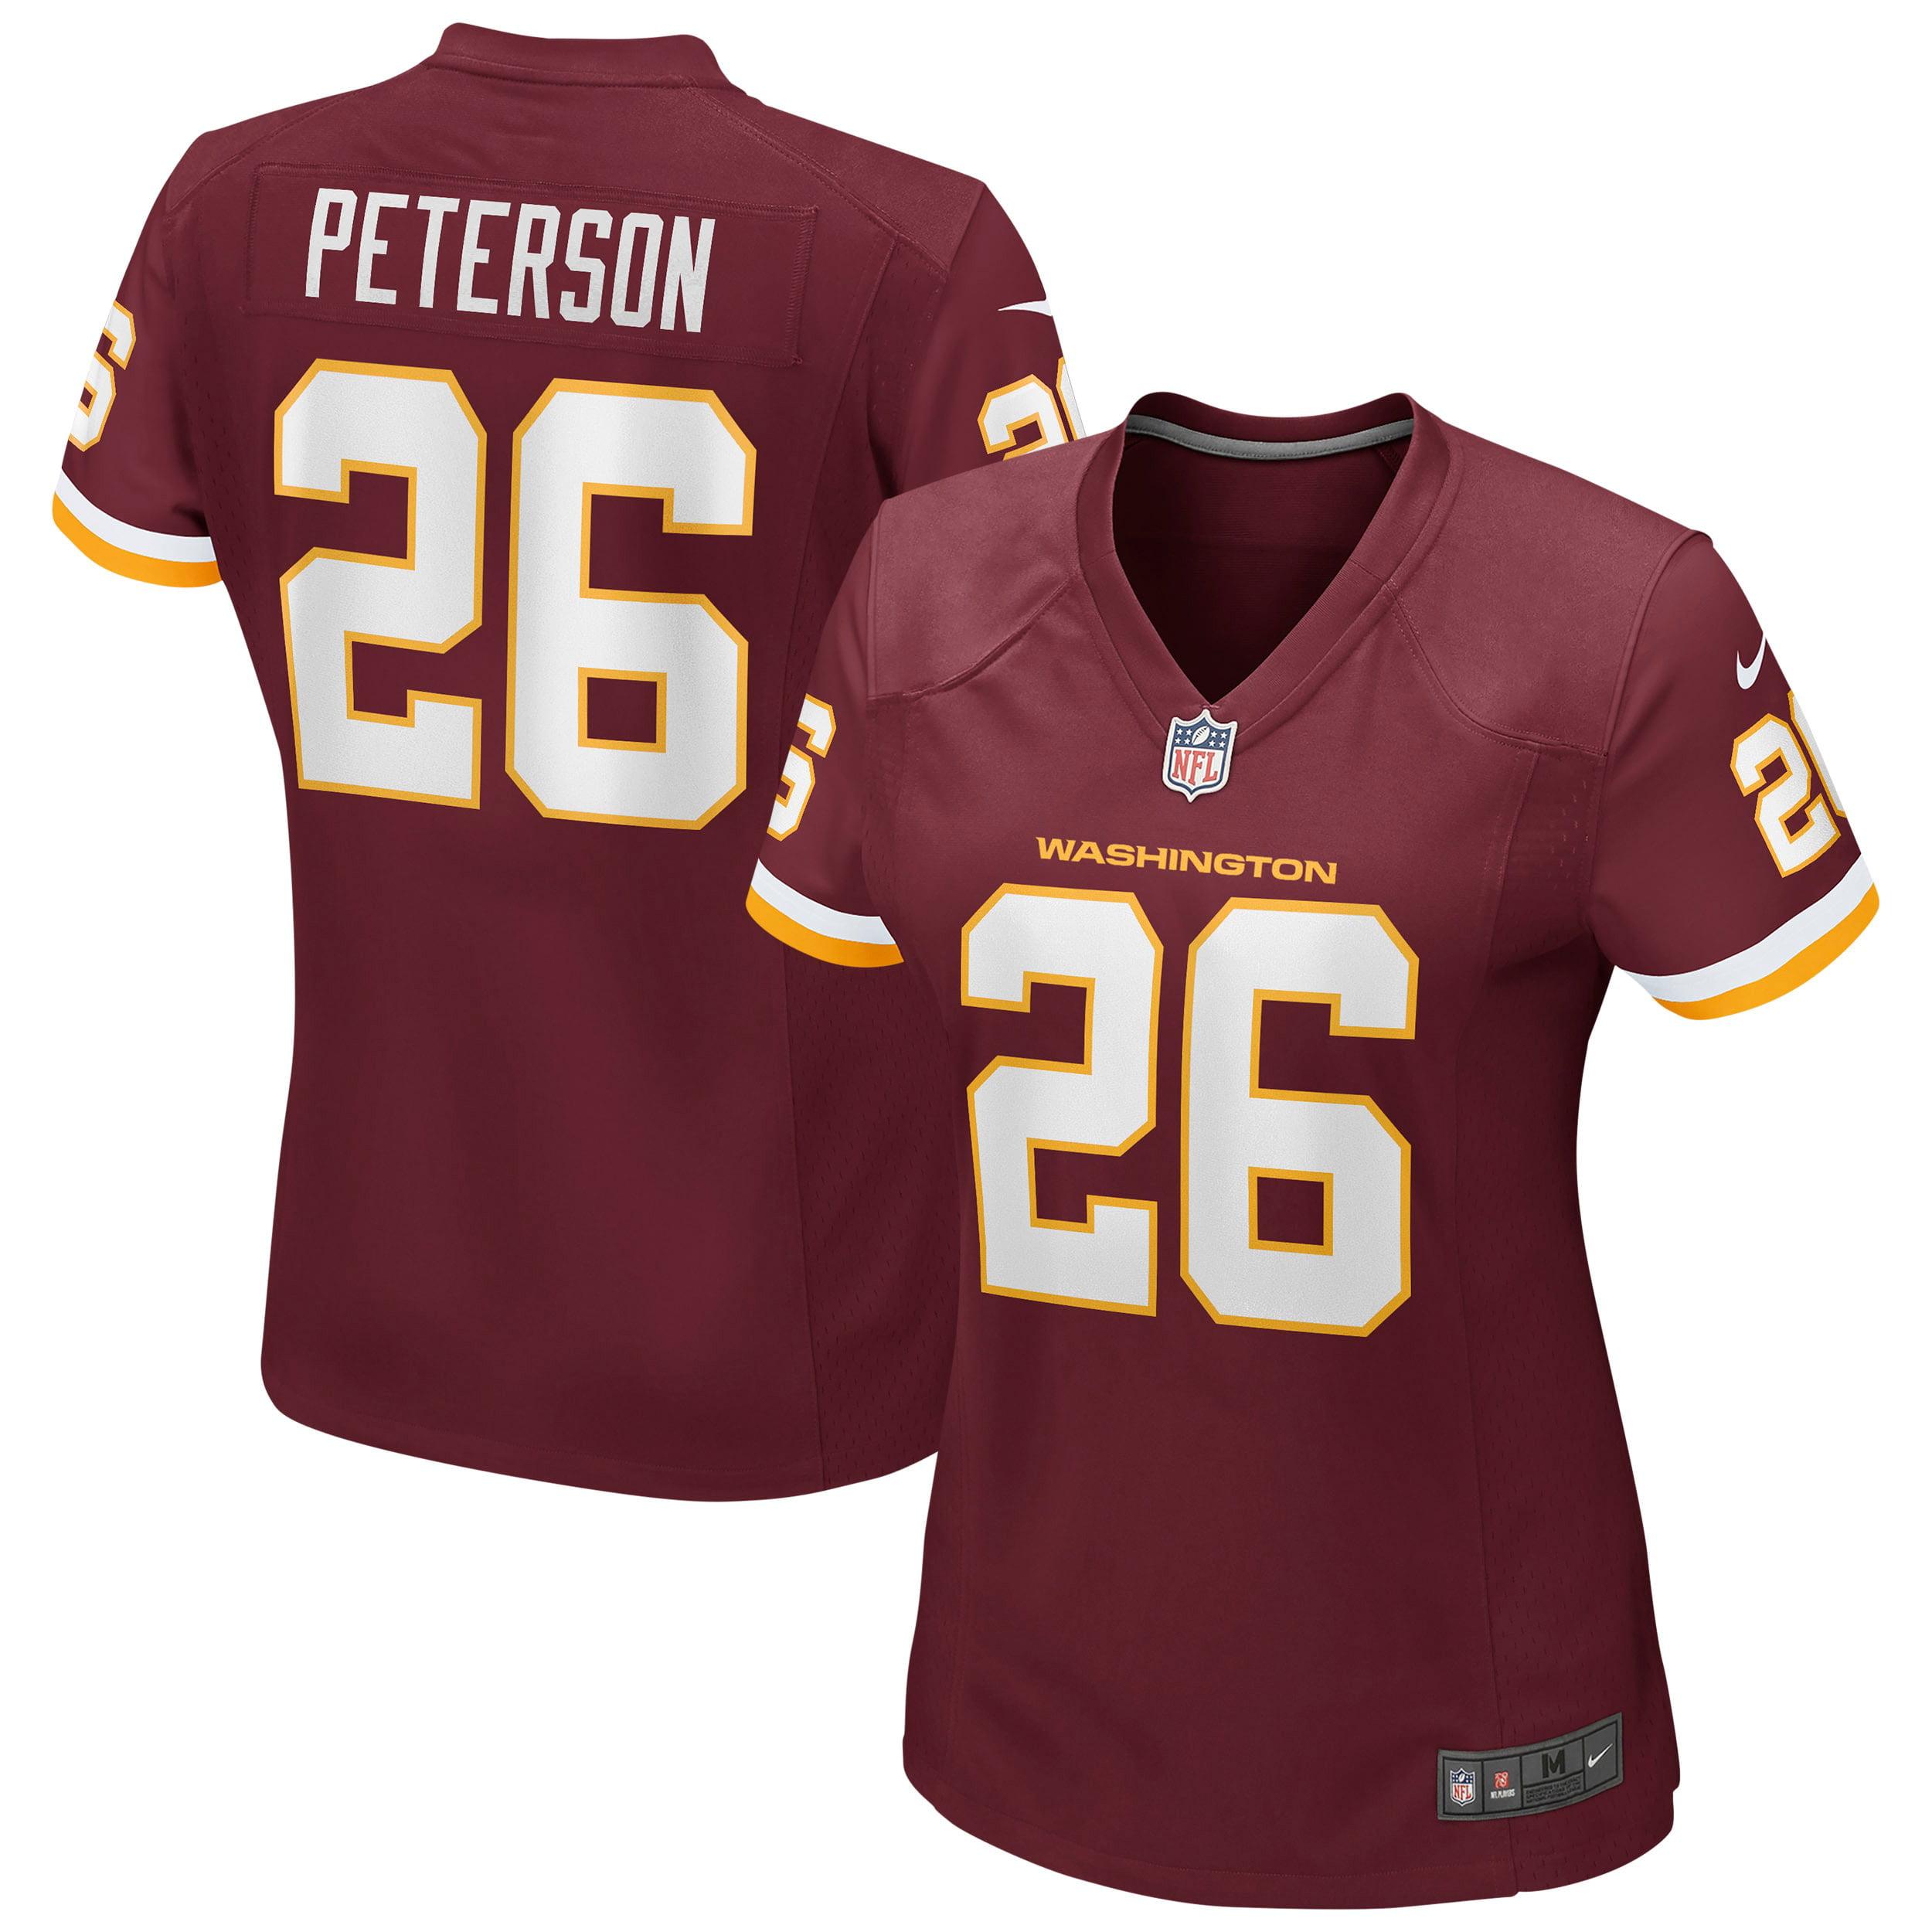 Adrian Peterson Washington Football Team Nike Women's Game Player Jersey -Burgundy - Walmart.com